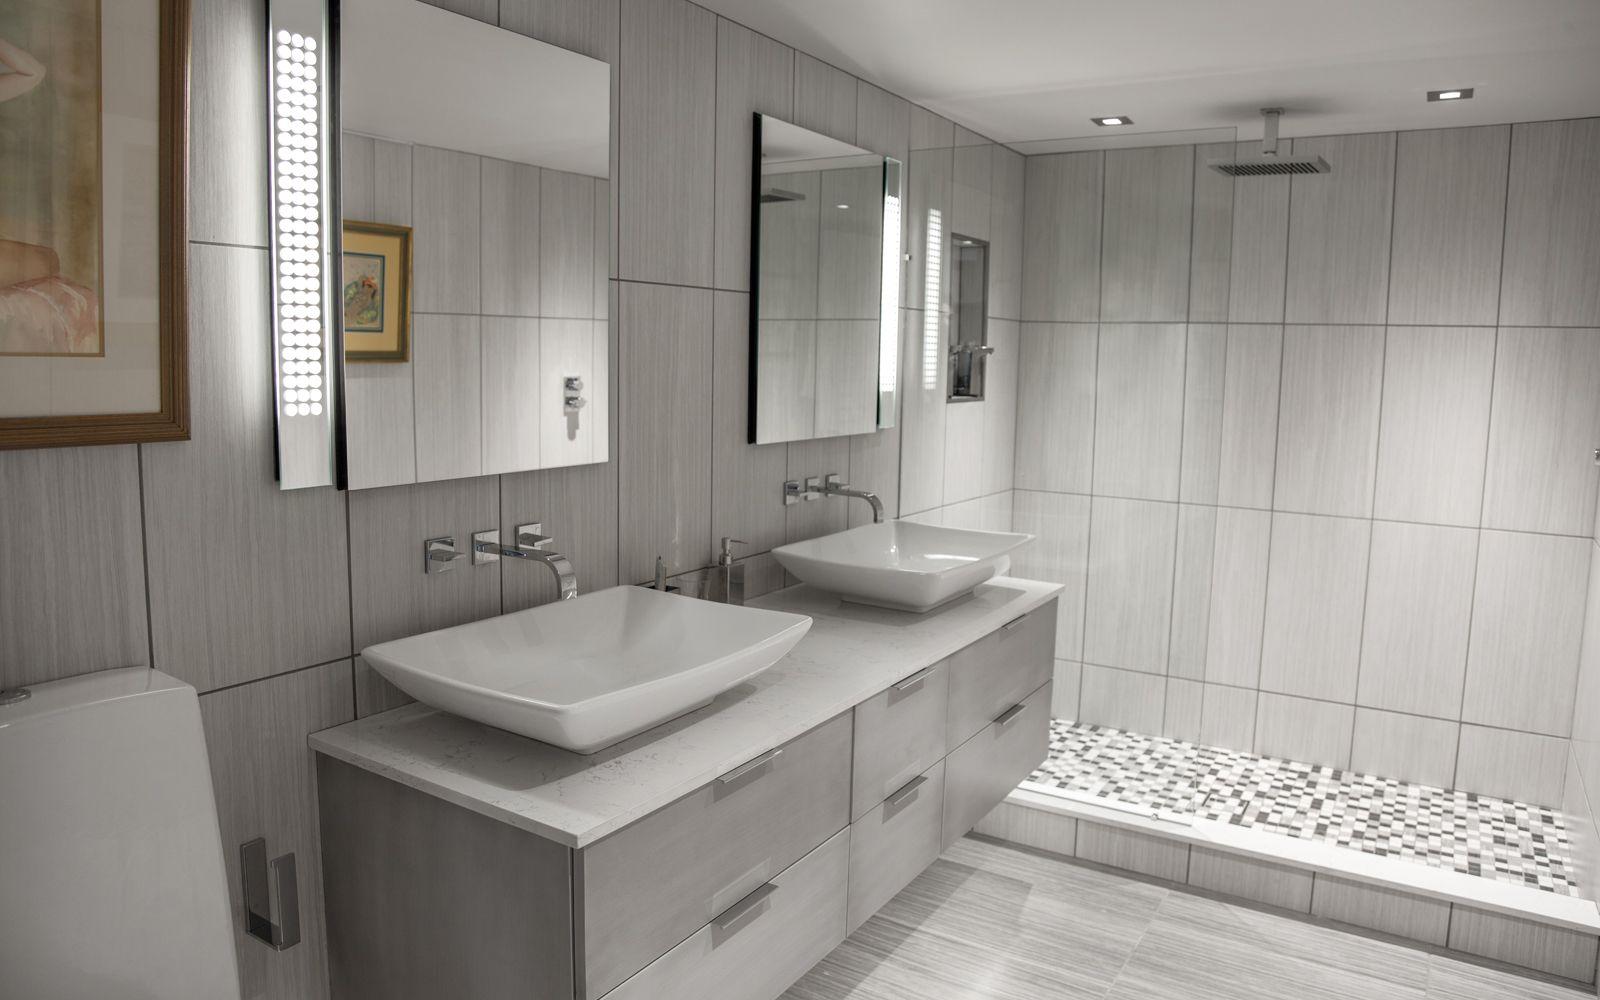 bathroom lighting emanation mirrored sconce boyd lighting